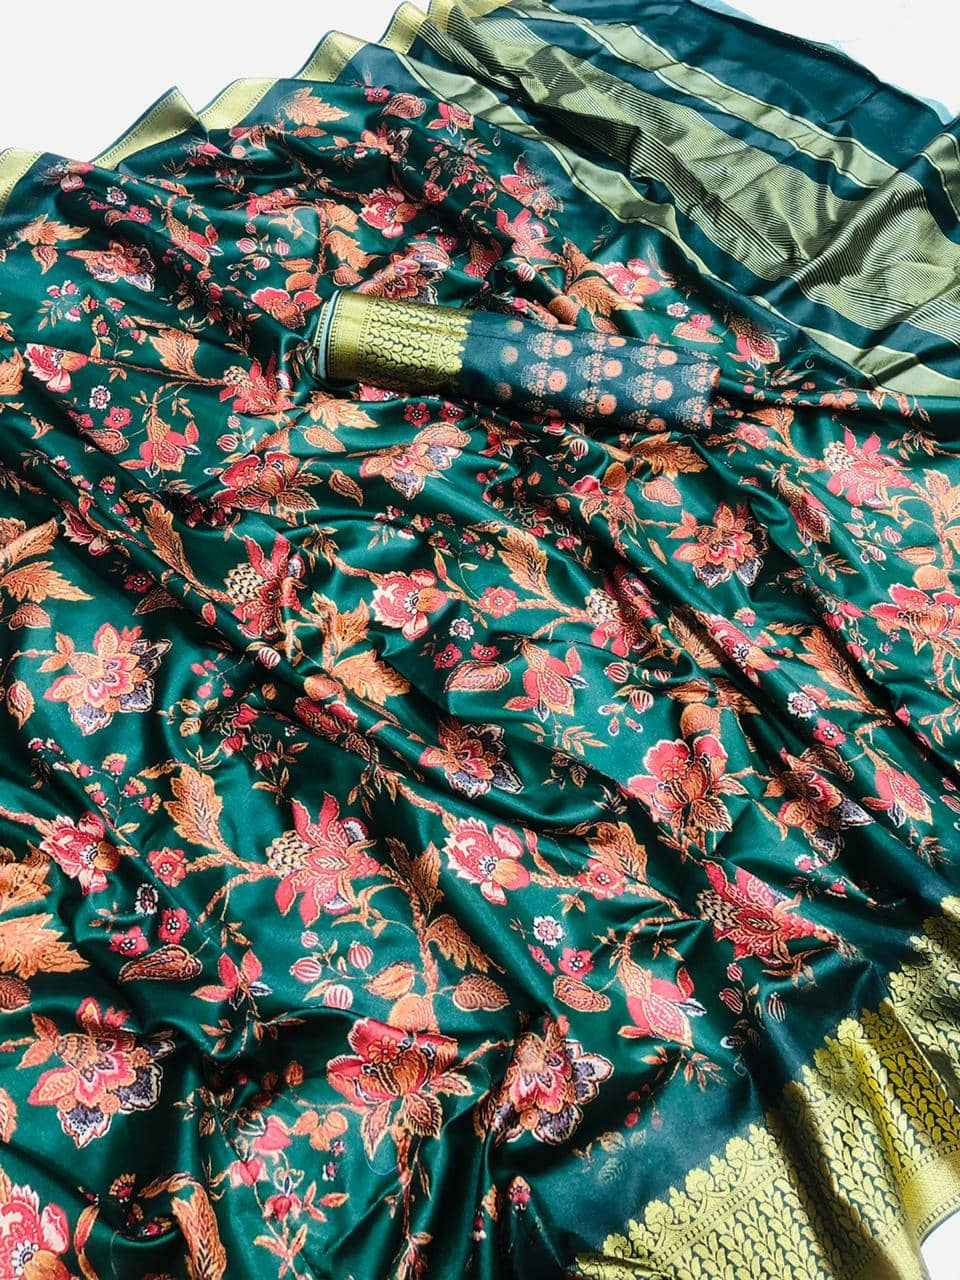 Soft cotton jacquard border with digital printed saree dvz0001541